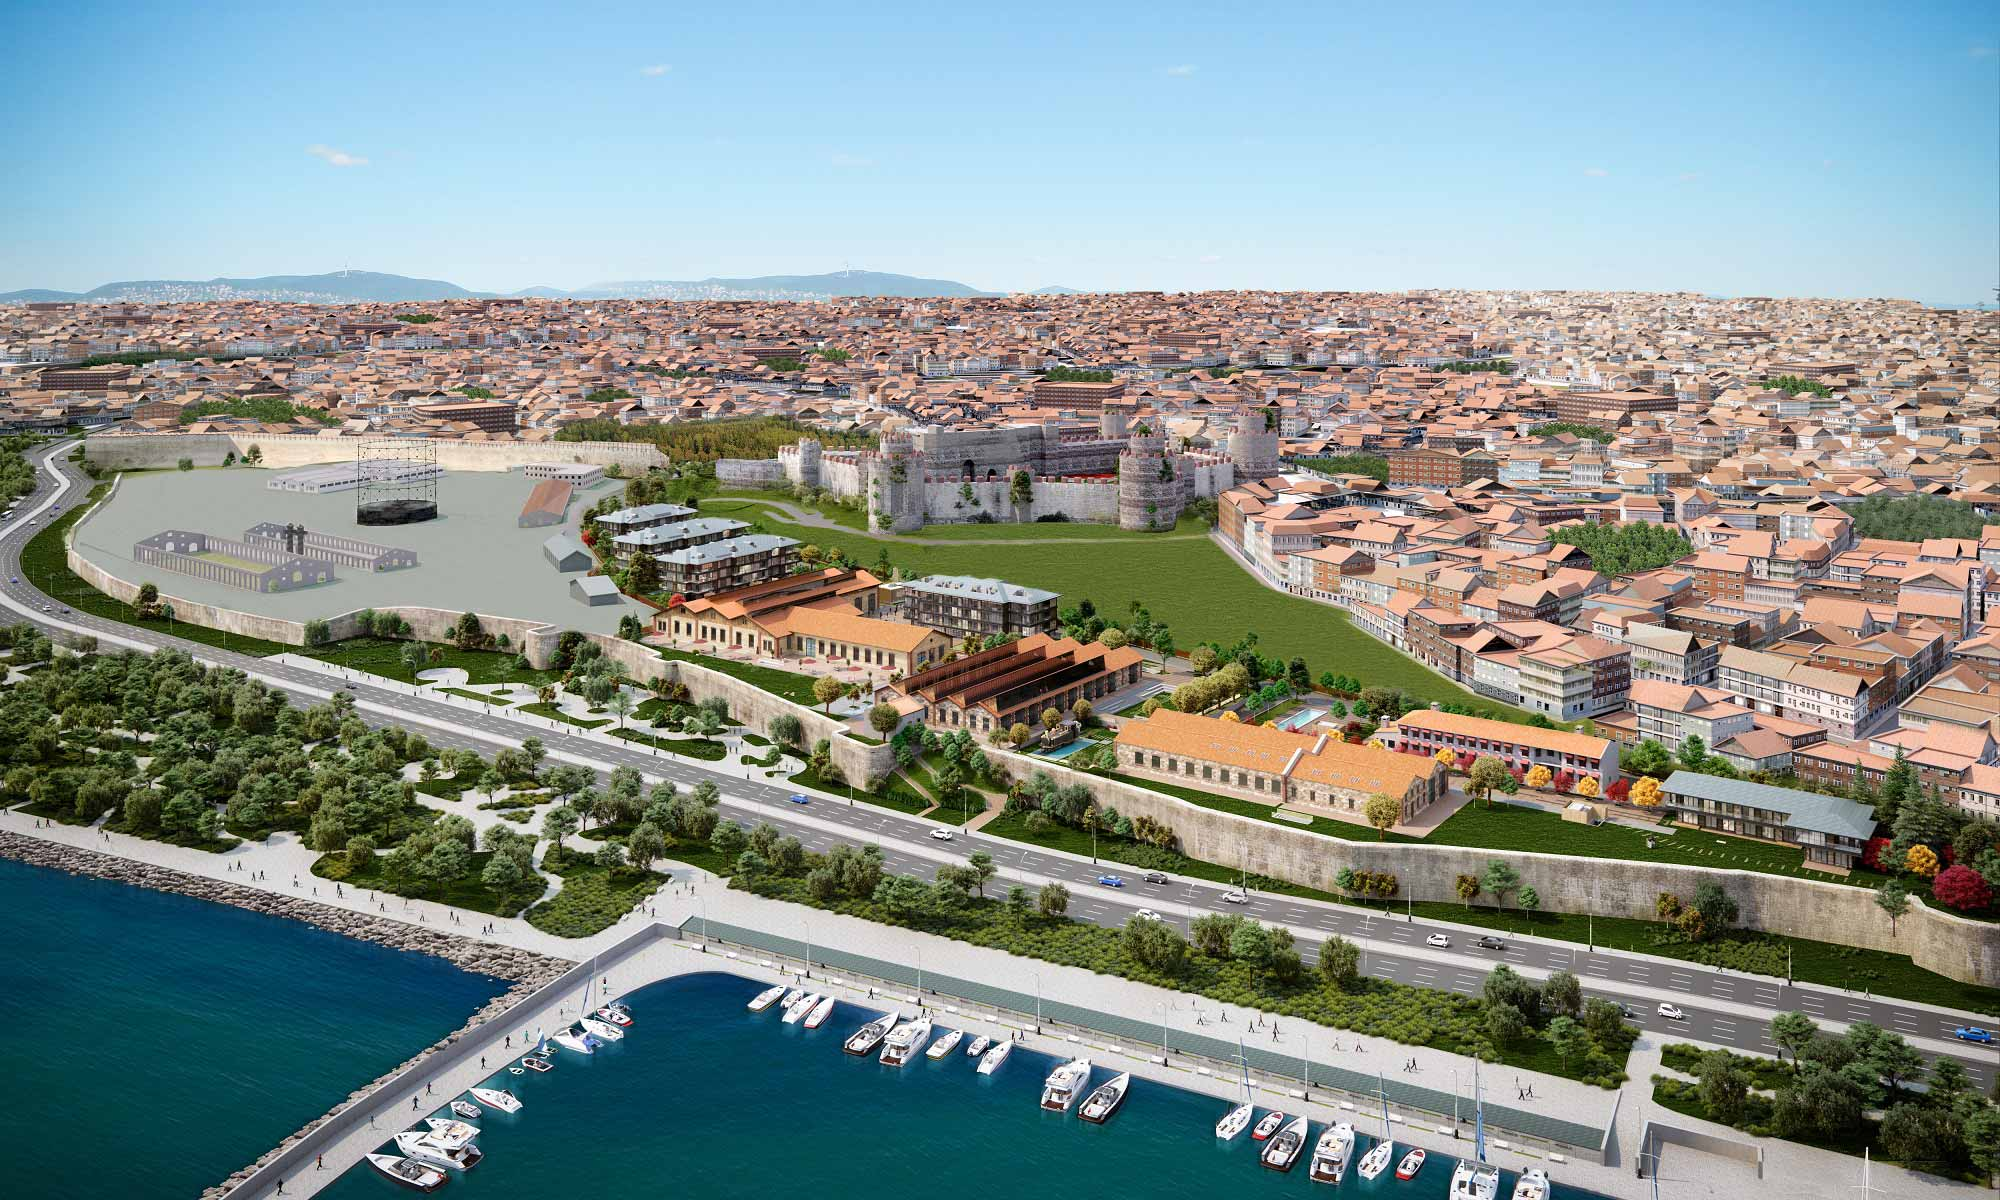 cer-istanbul-project-seaside-001-6.jpg